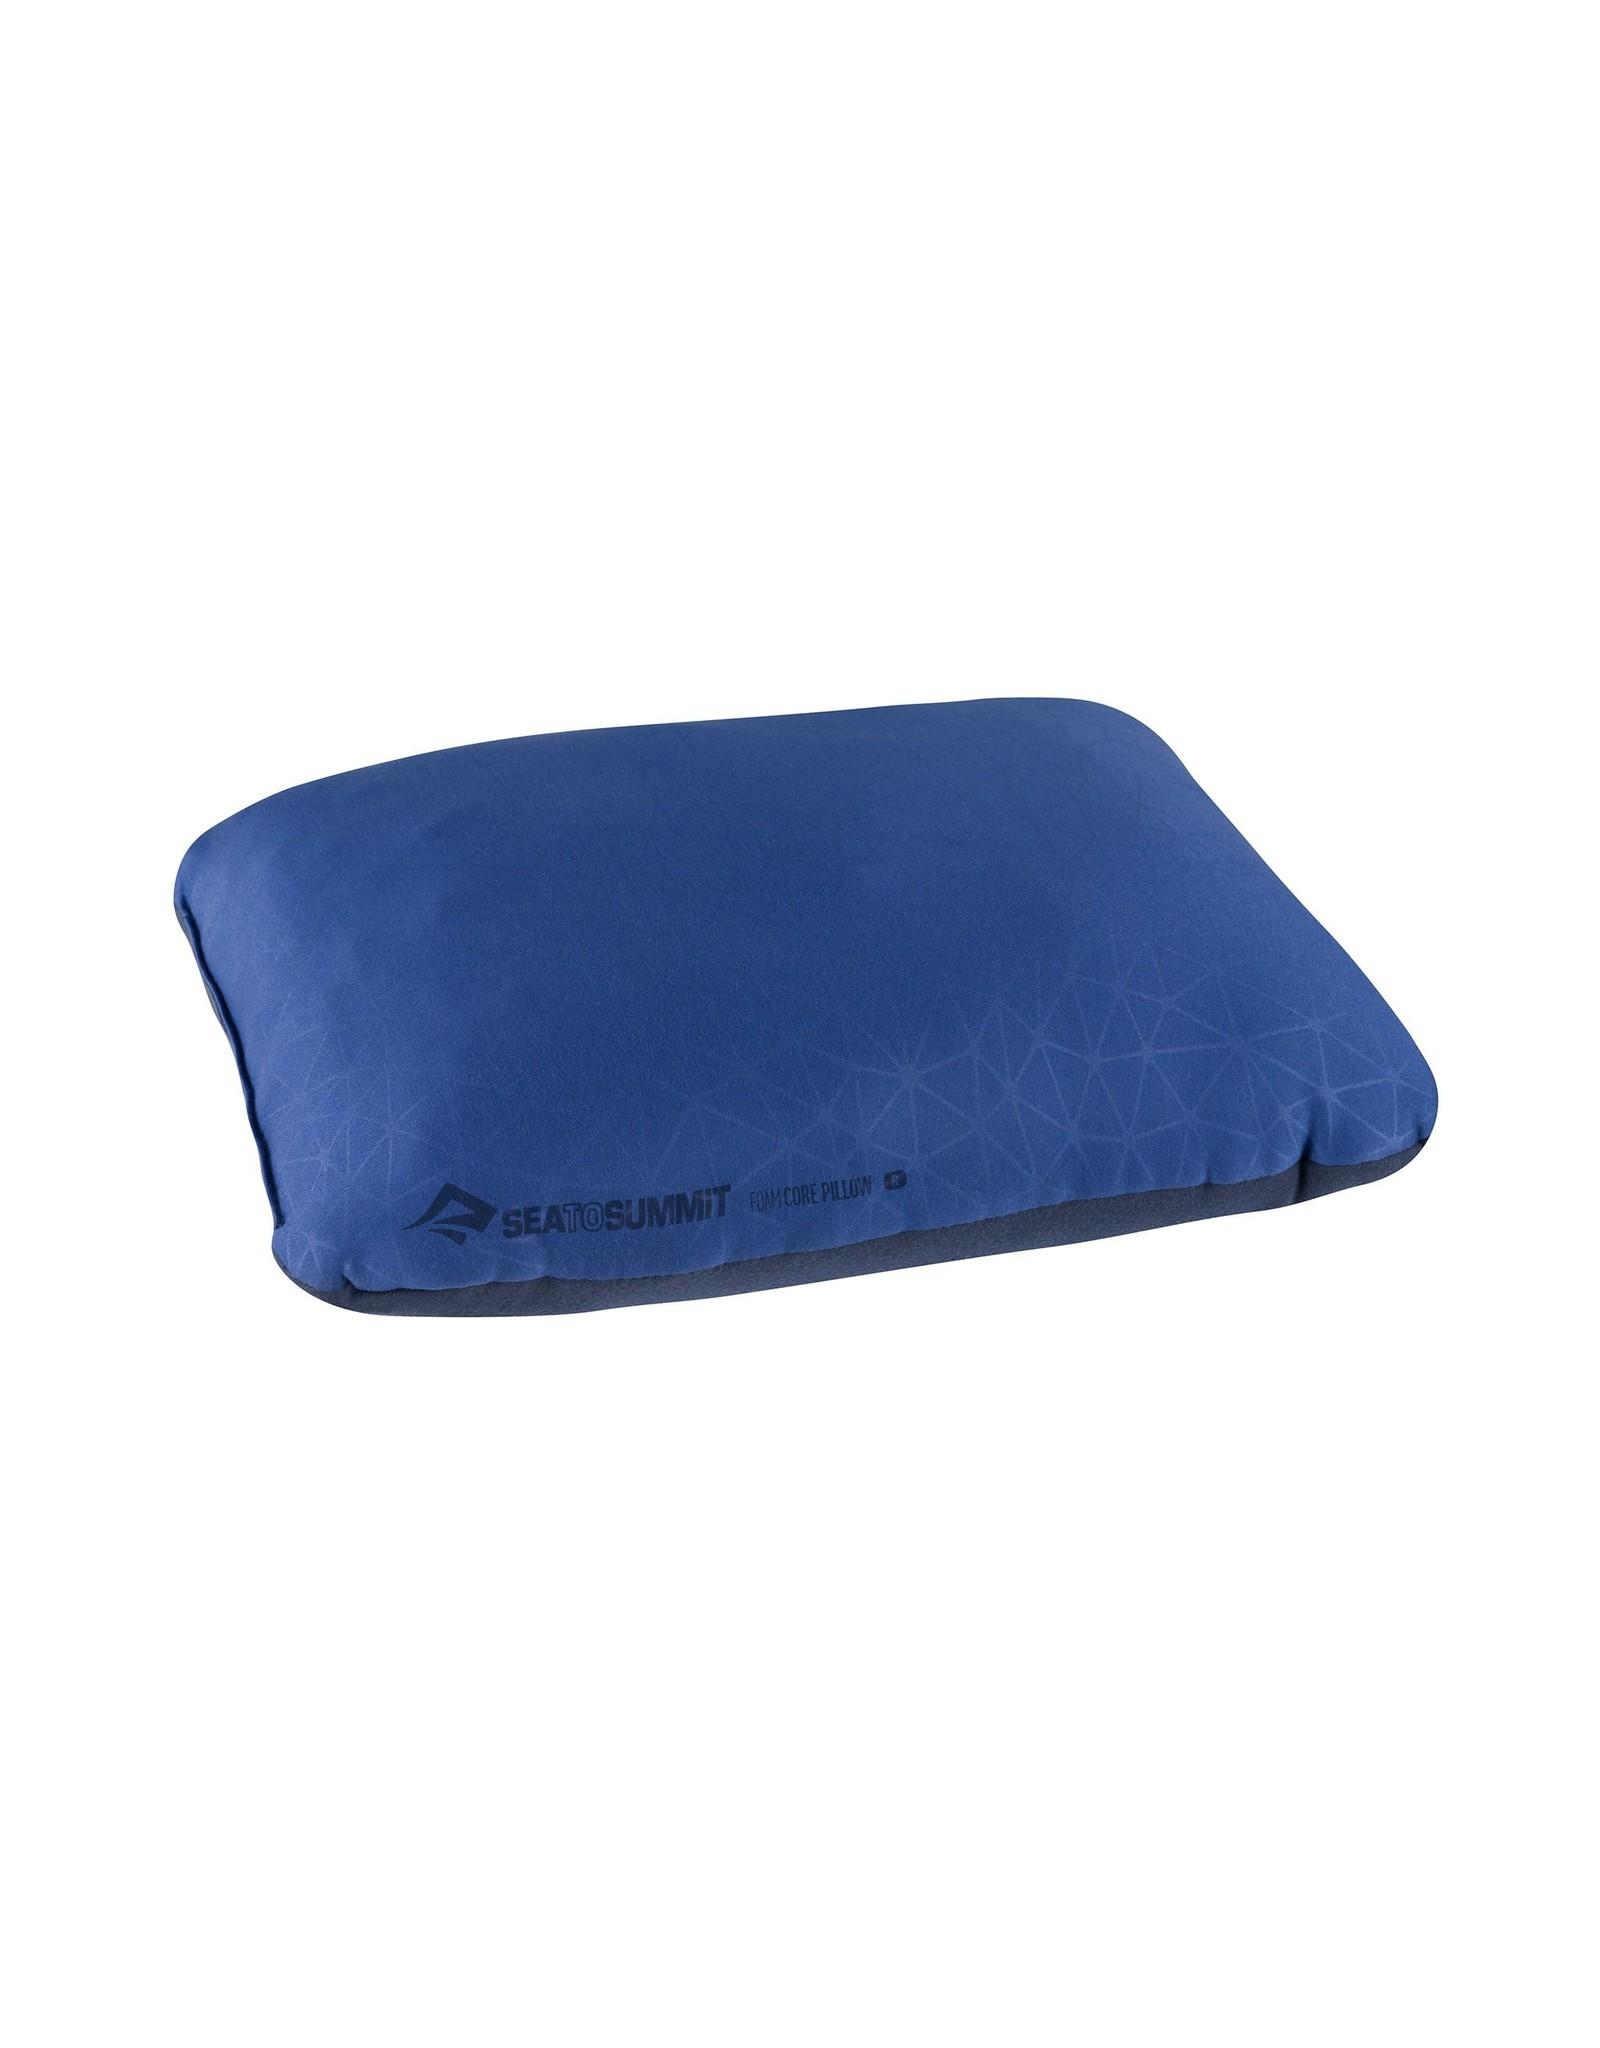 FoamCore Pillow - Regular